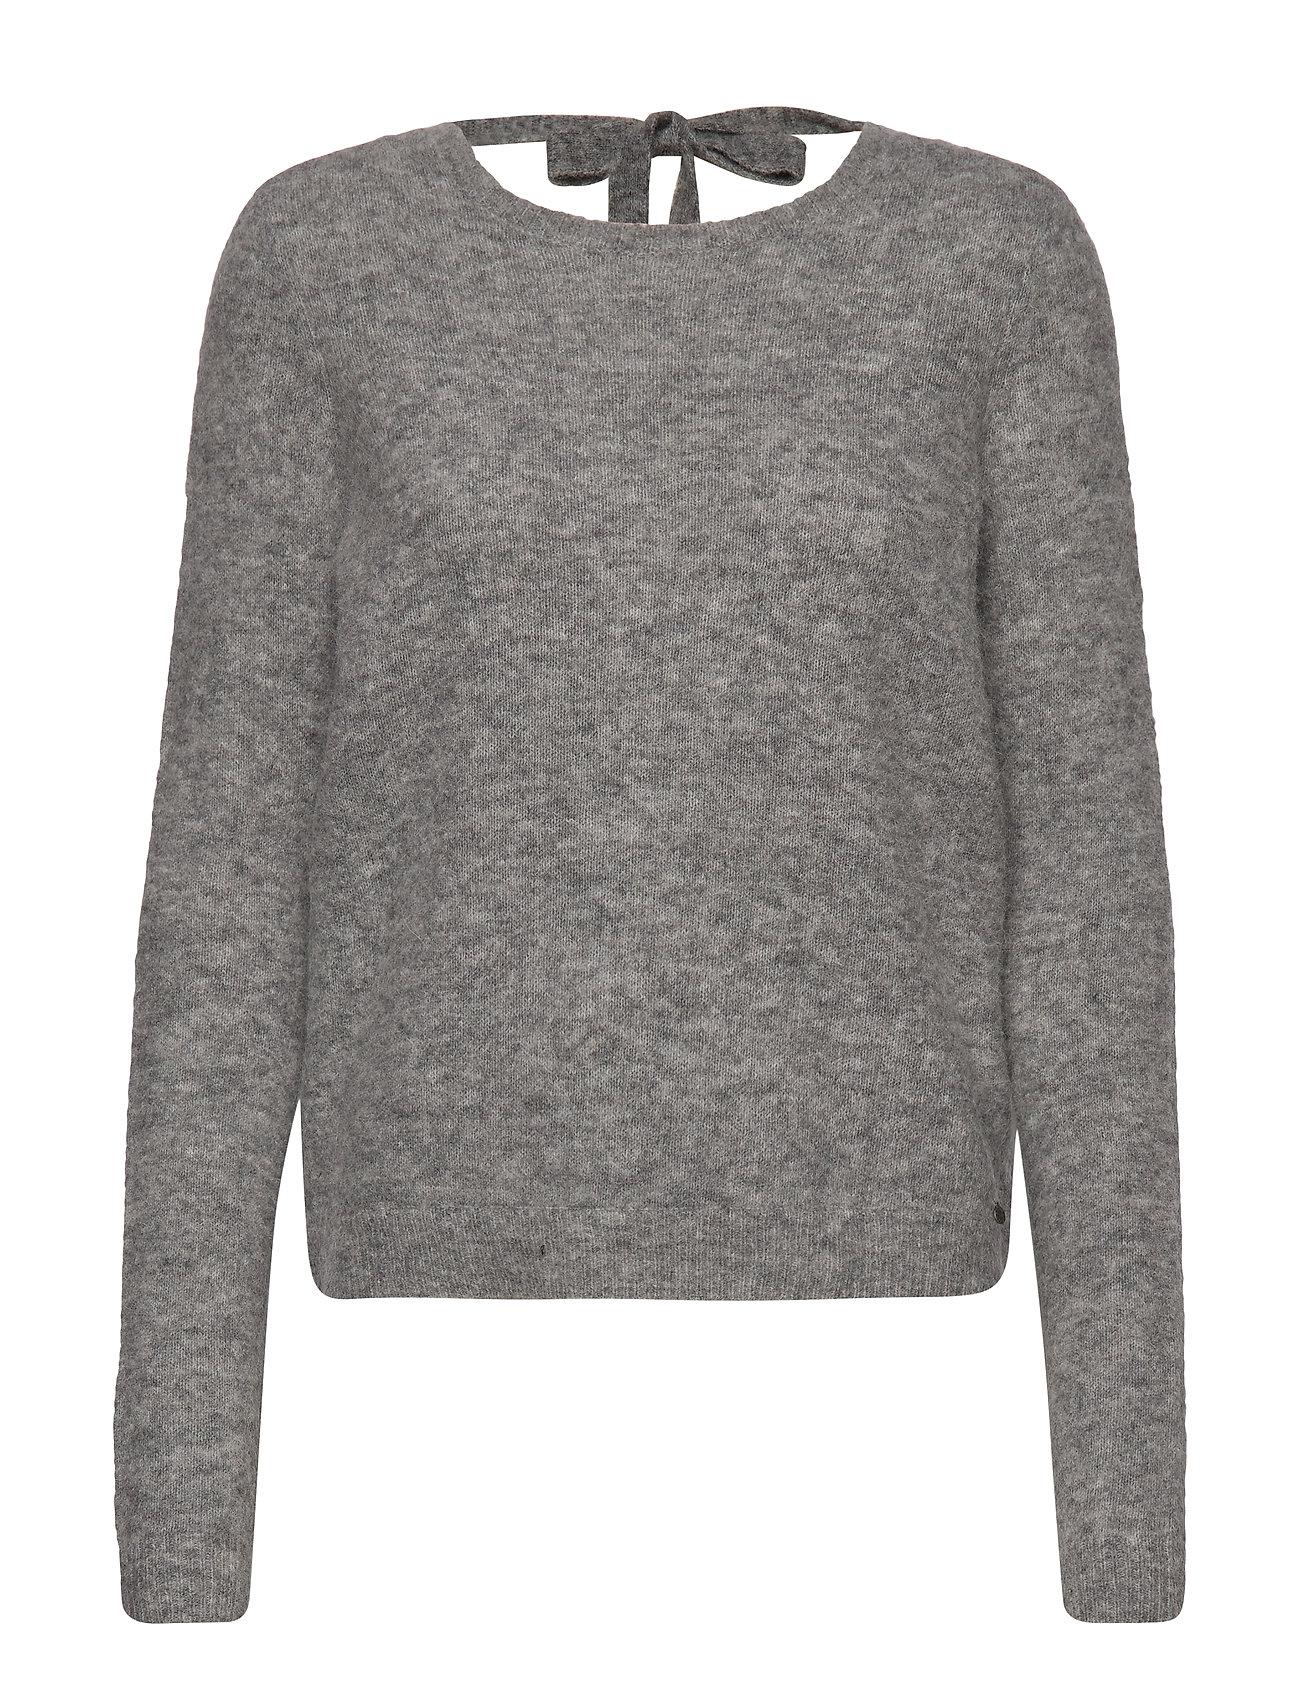 Twist & Tango Hedvig Sweater - GREY MéLANGE